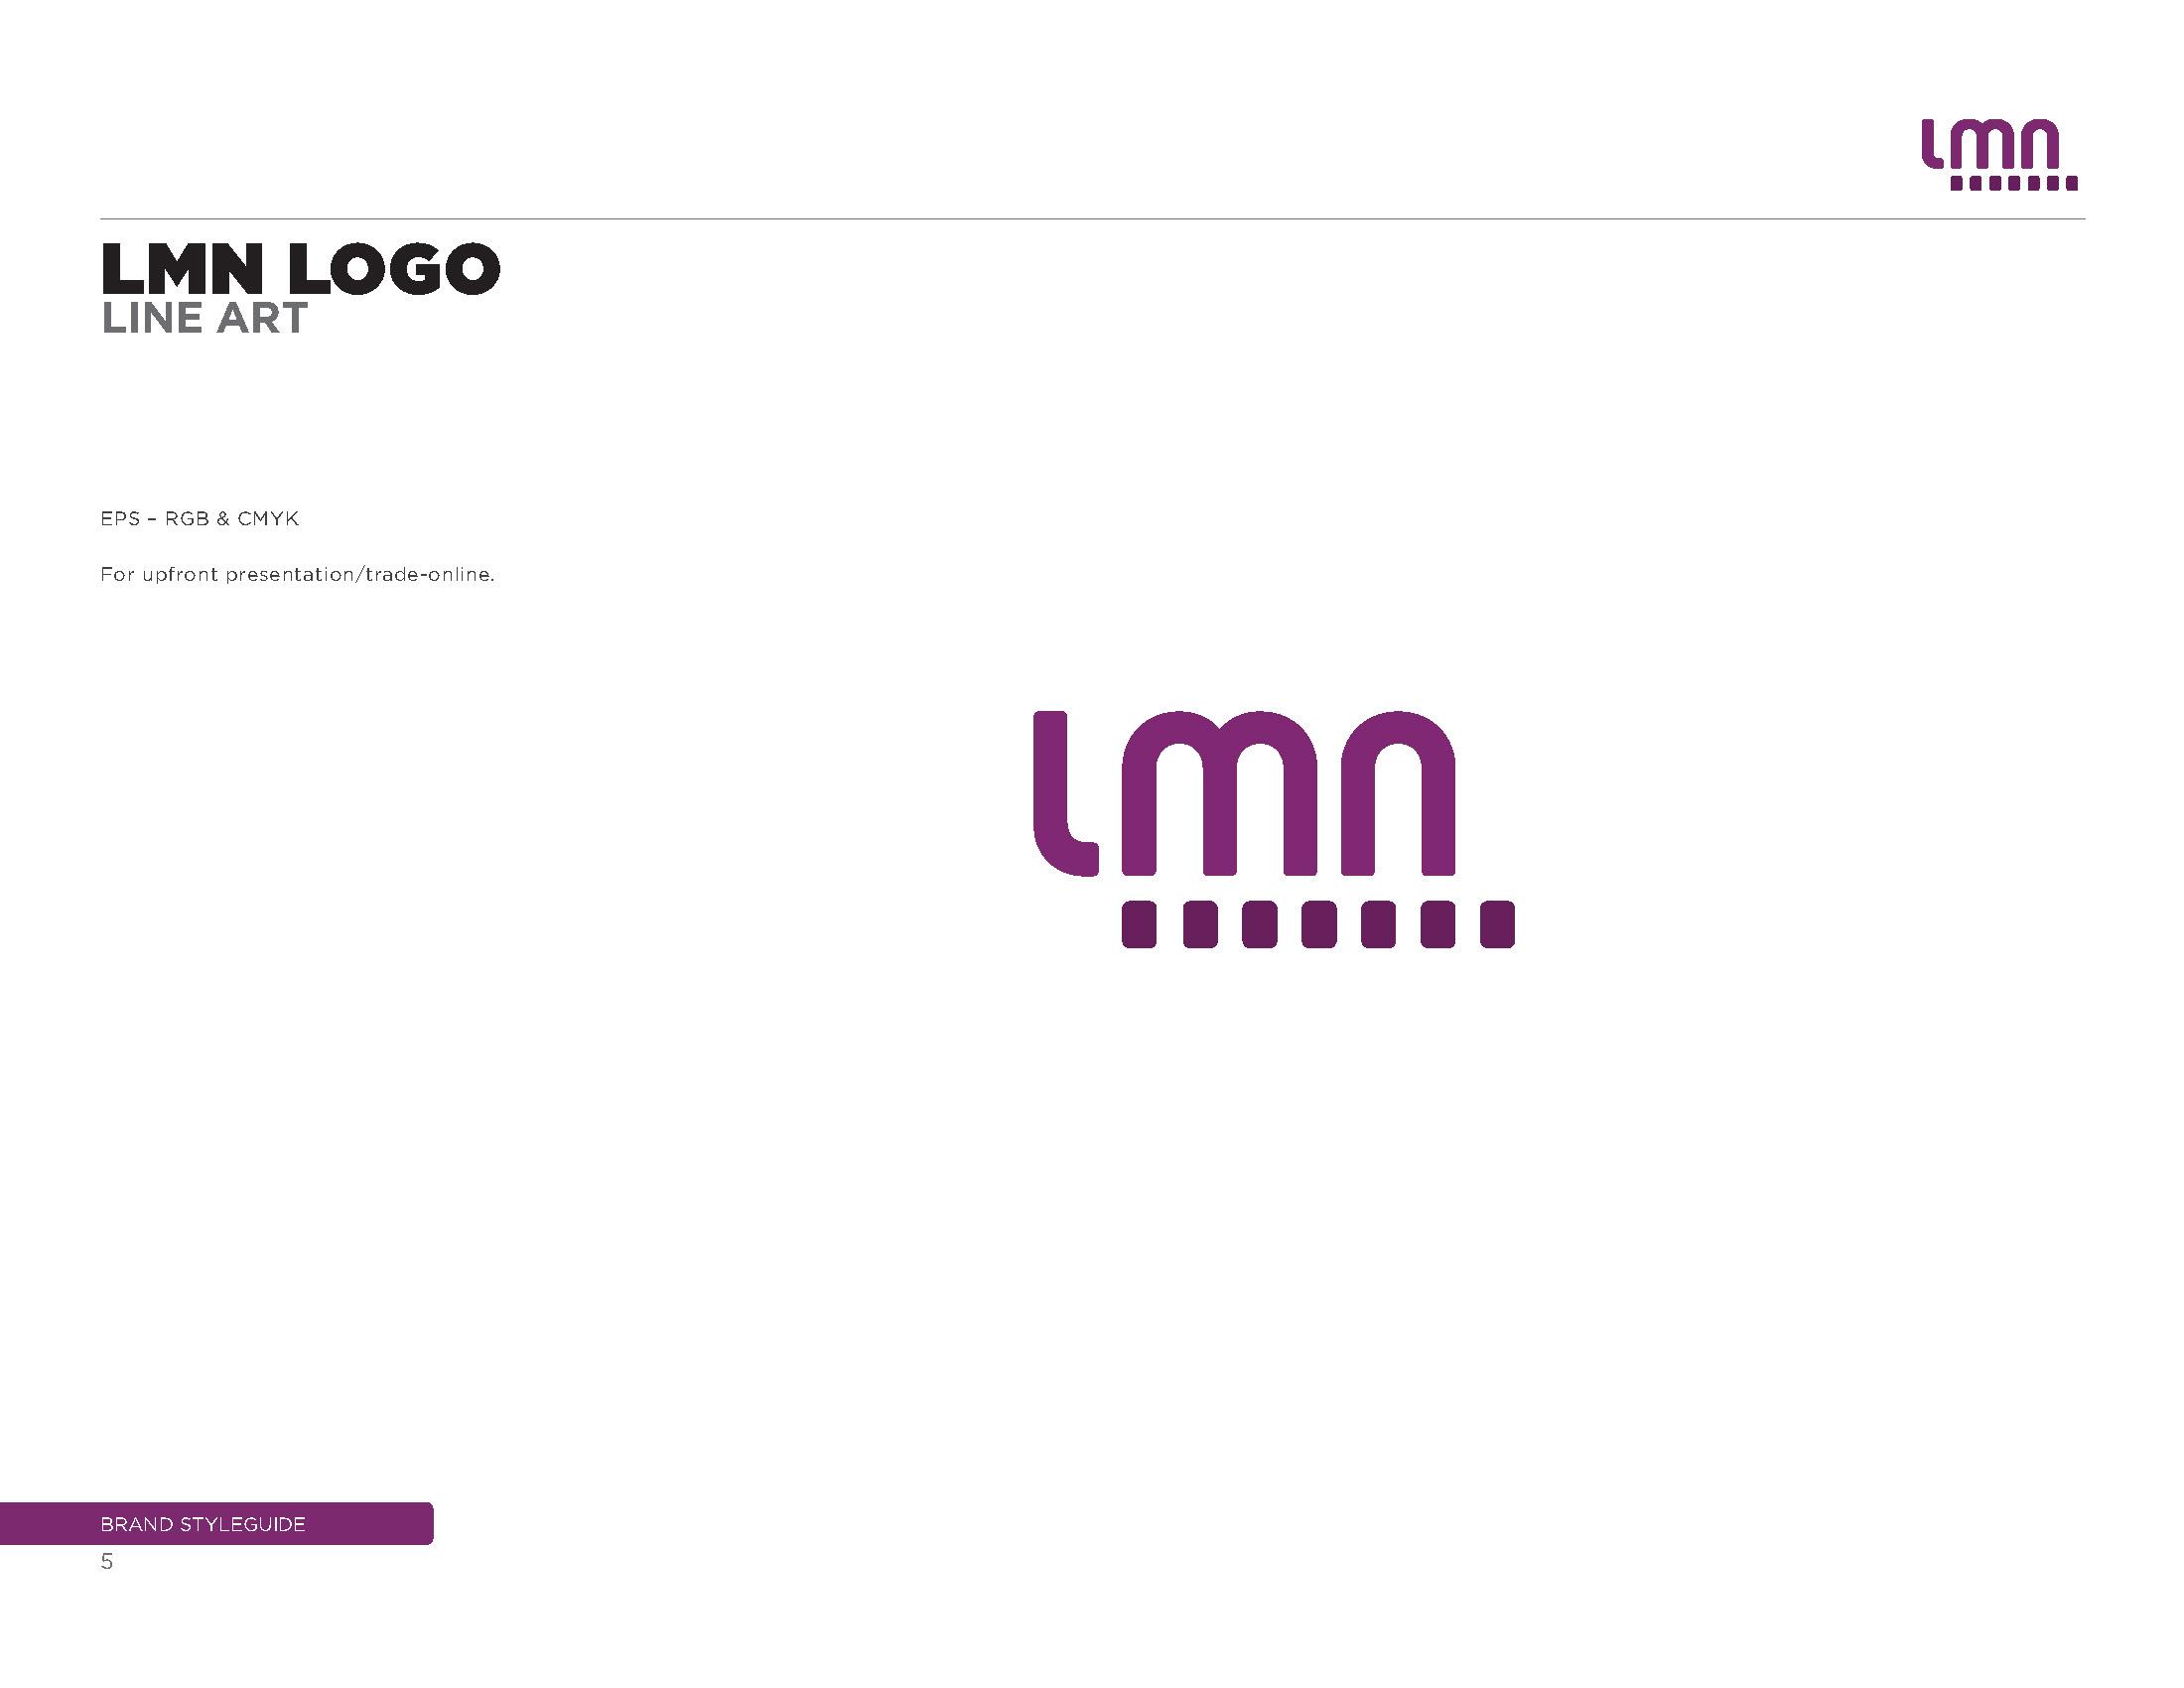 LMN_styleguide_092711_HQ_Page_05.jpg